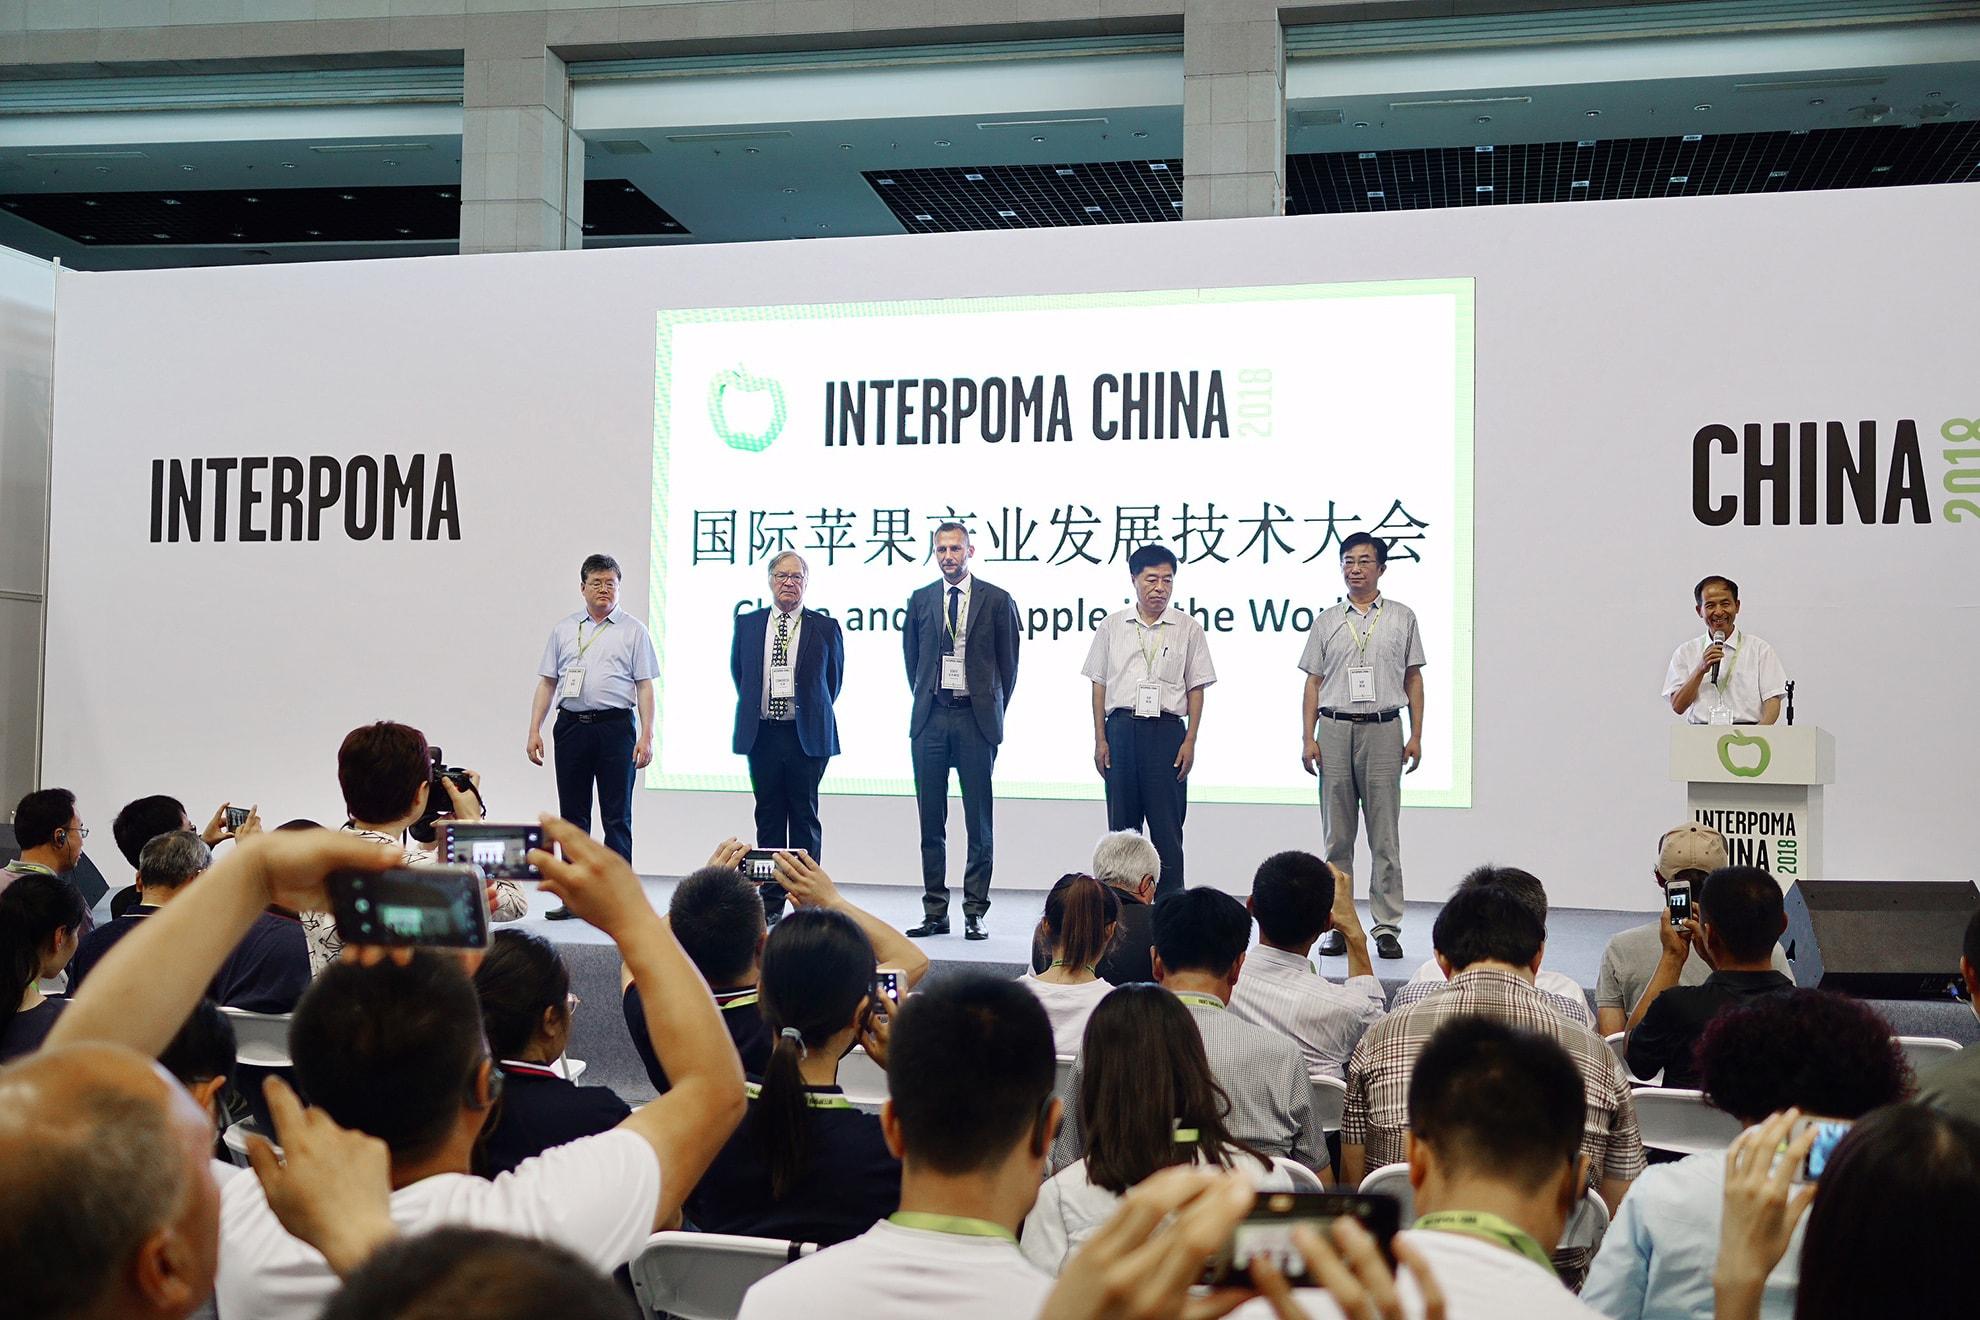 Interpoma China